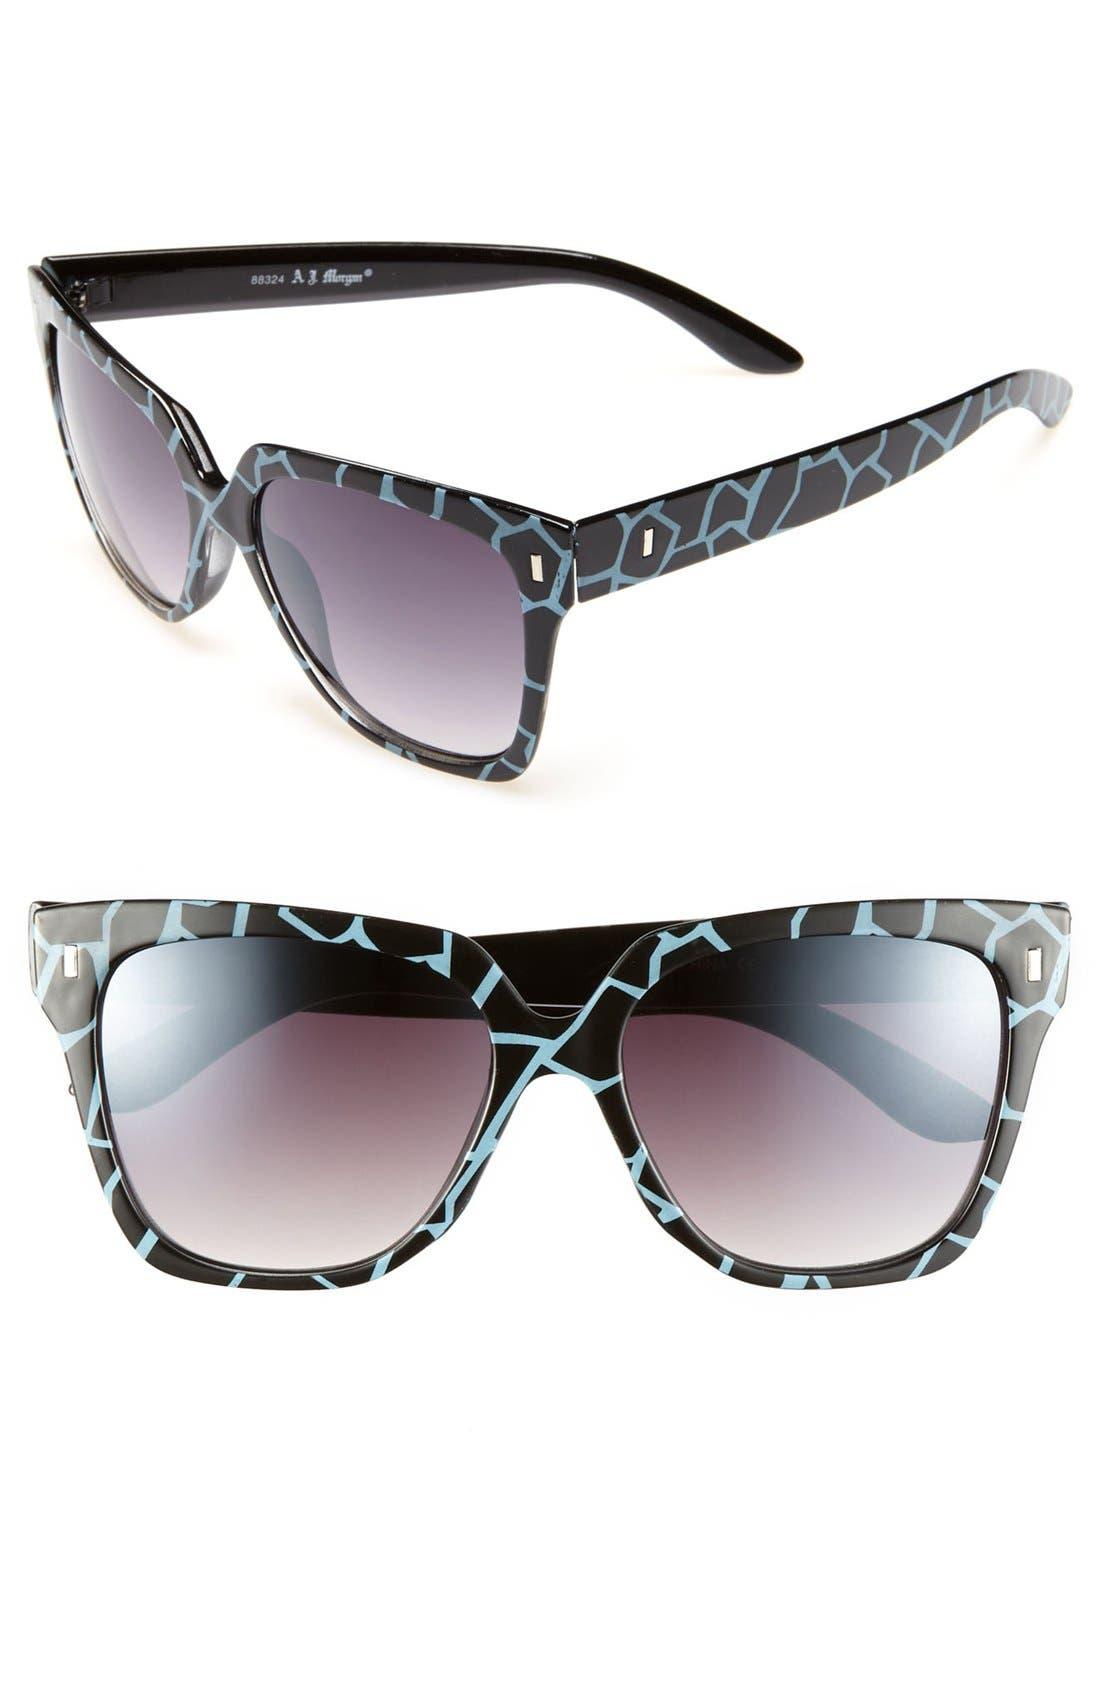 Main Image - A.J. Morgan Sunglasses